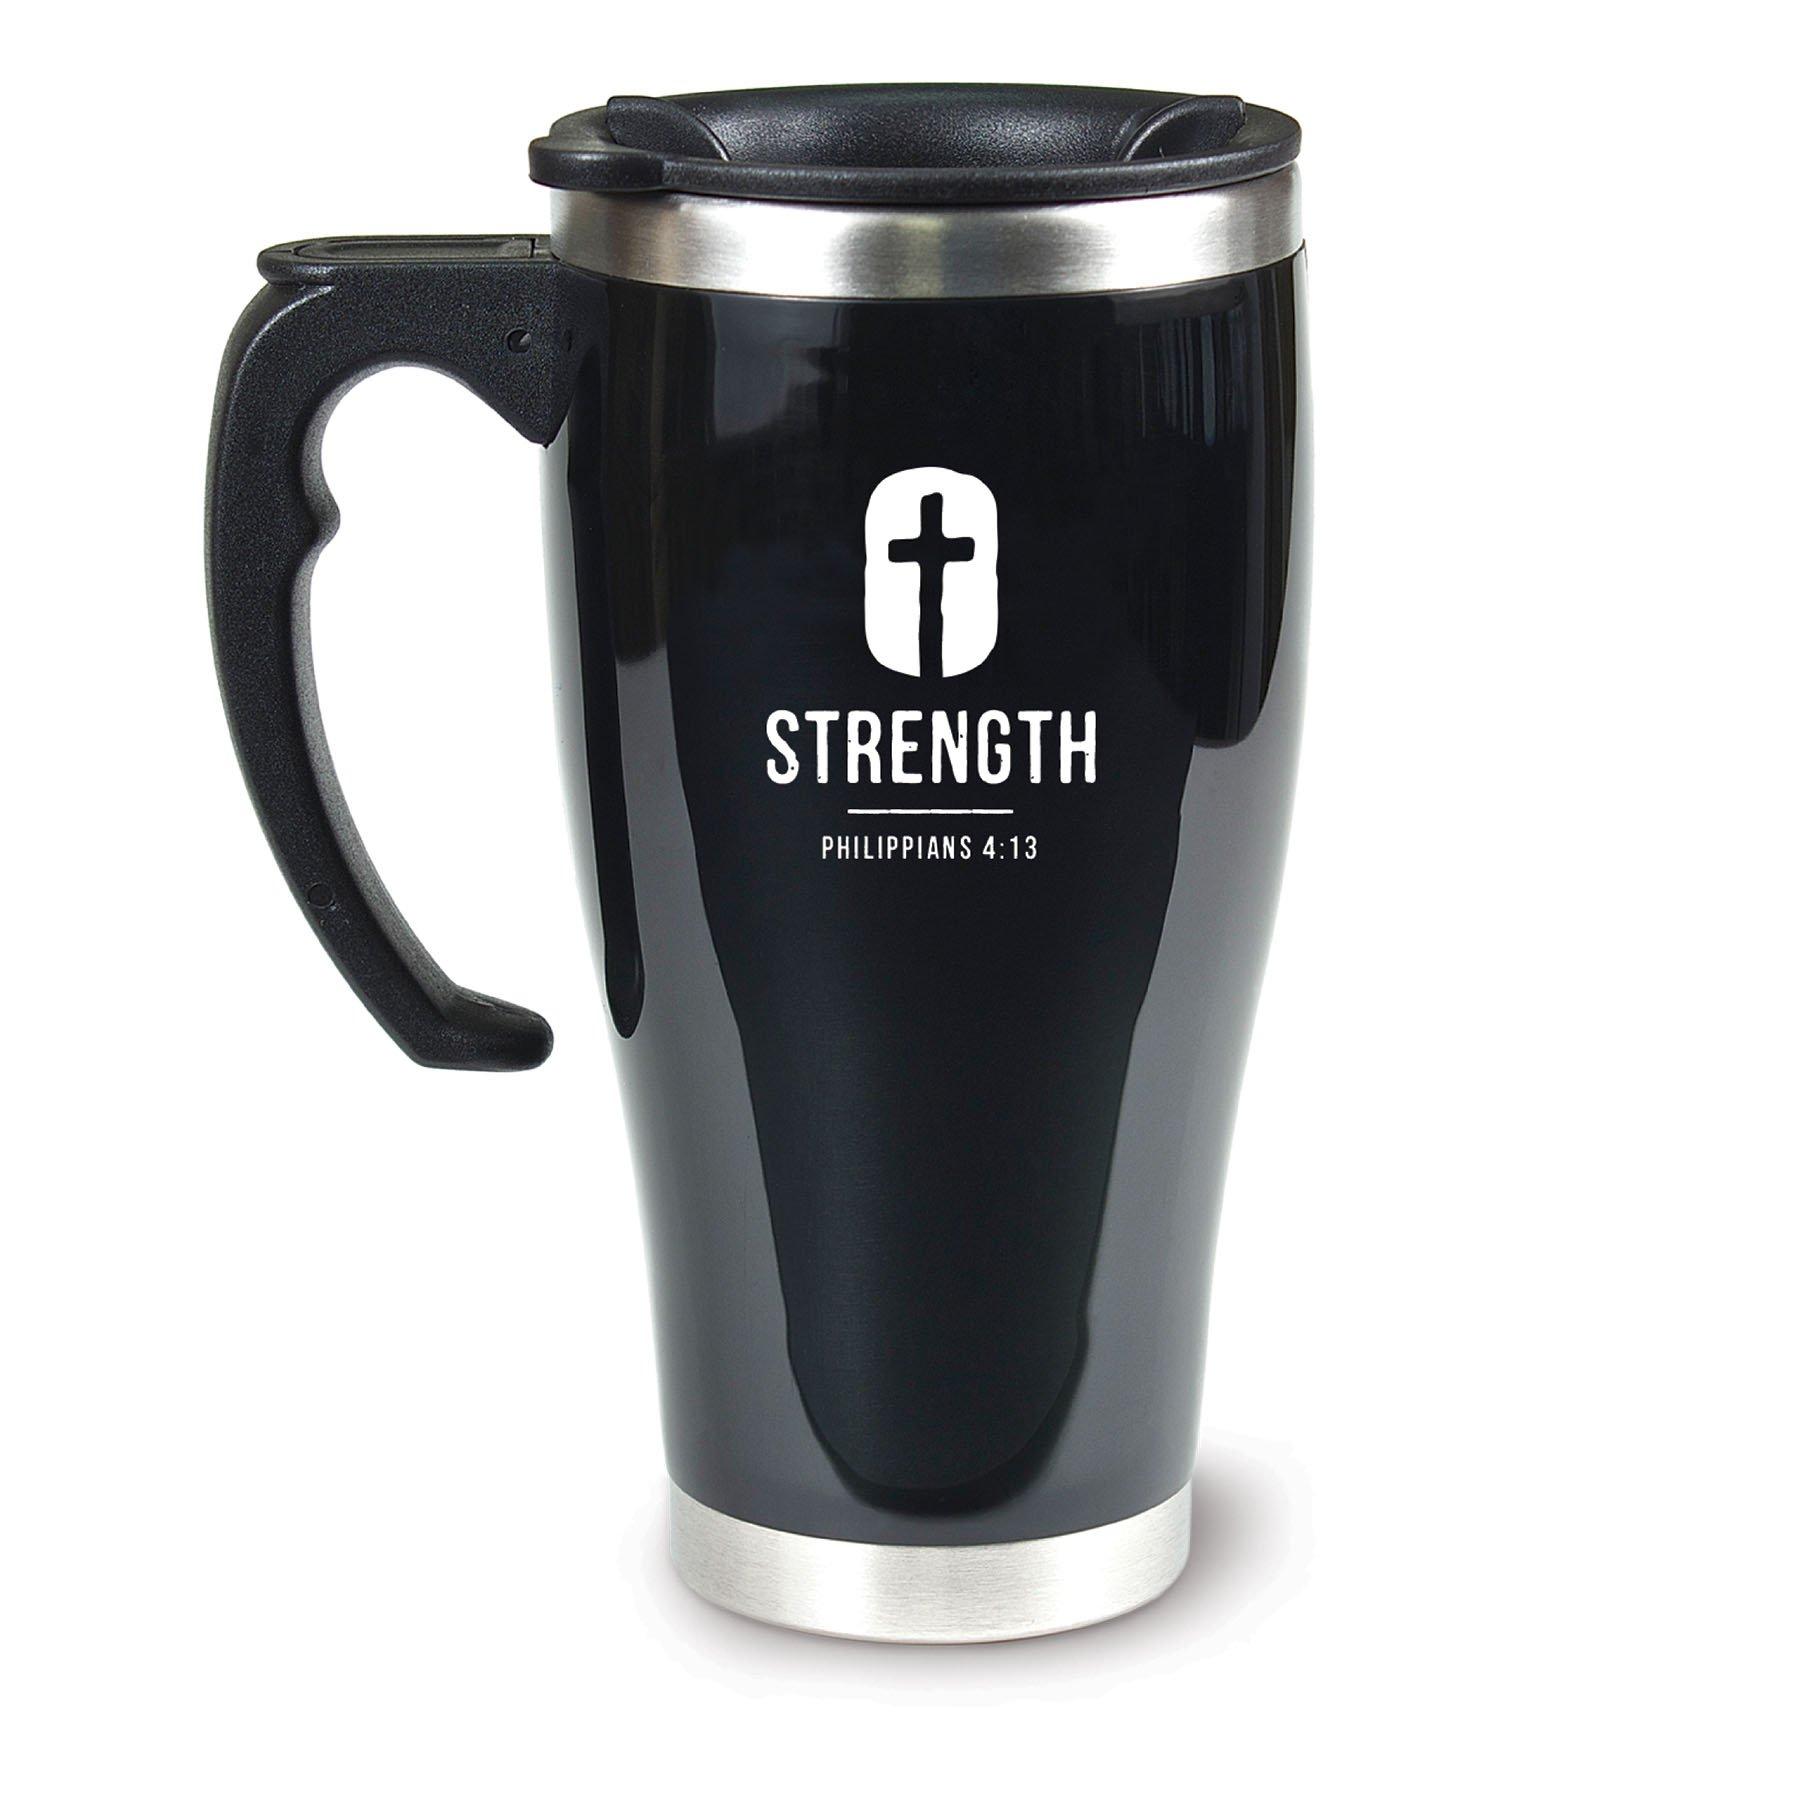 Lighthouse Christian Products Strength Acrylic/Stainless Steel Travel Mug, 18 oz